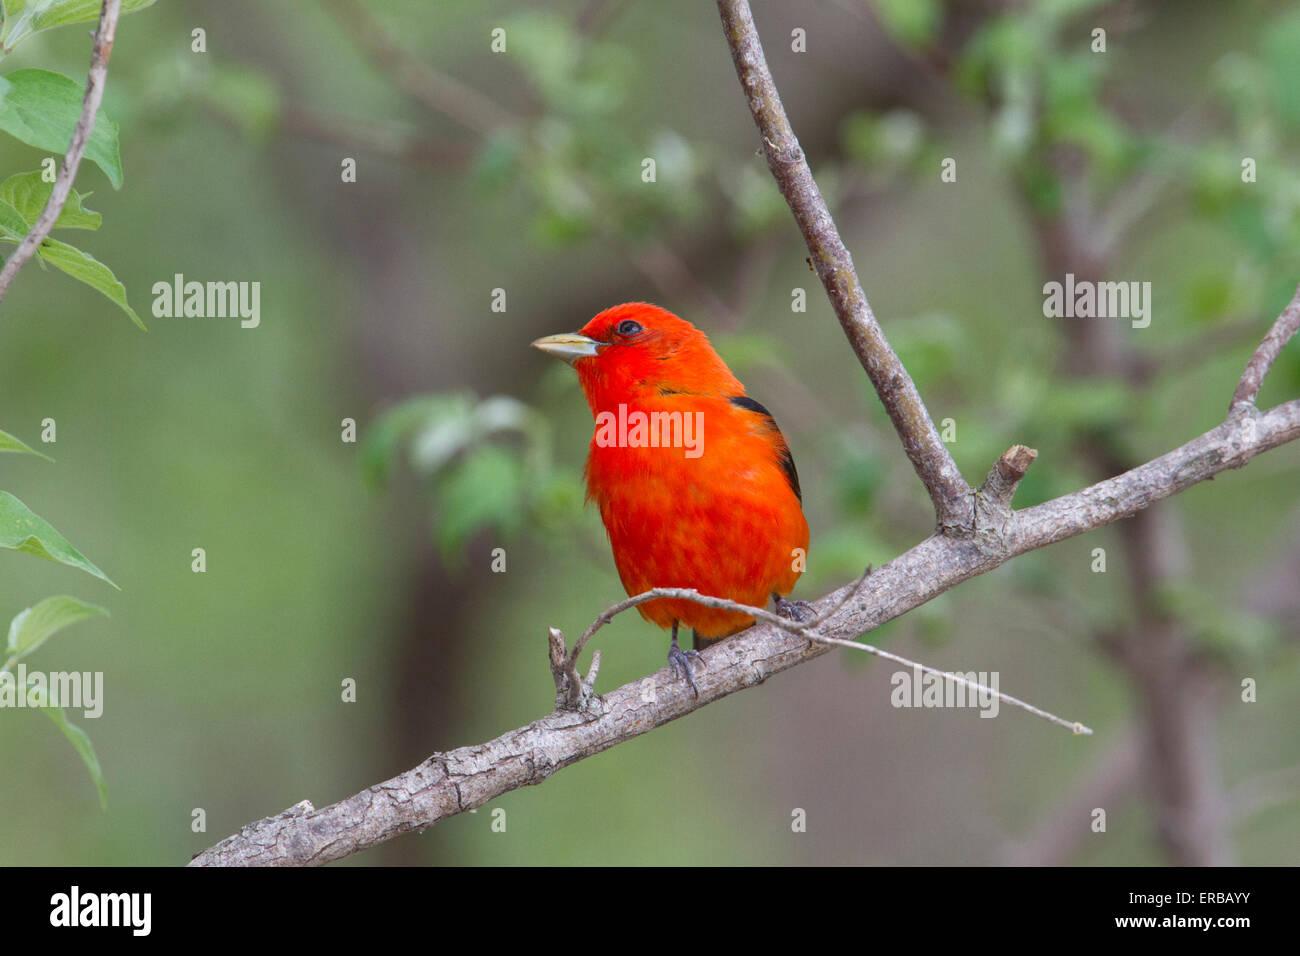 Male Scarlet Tanager (Piranga olivacea) - Stock Image